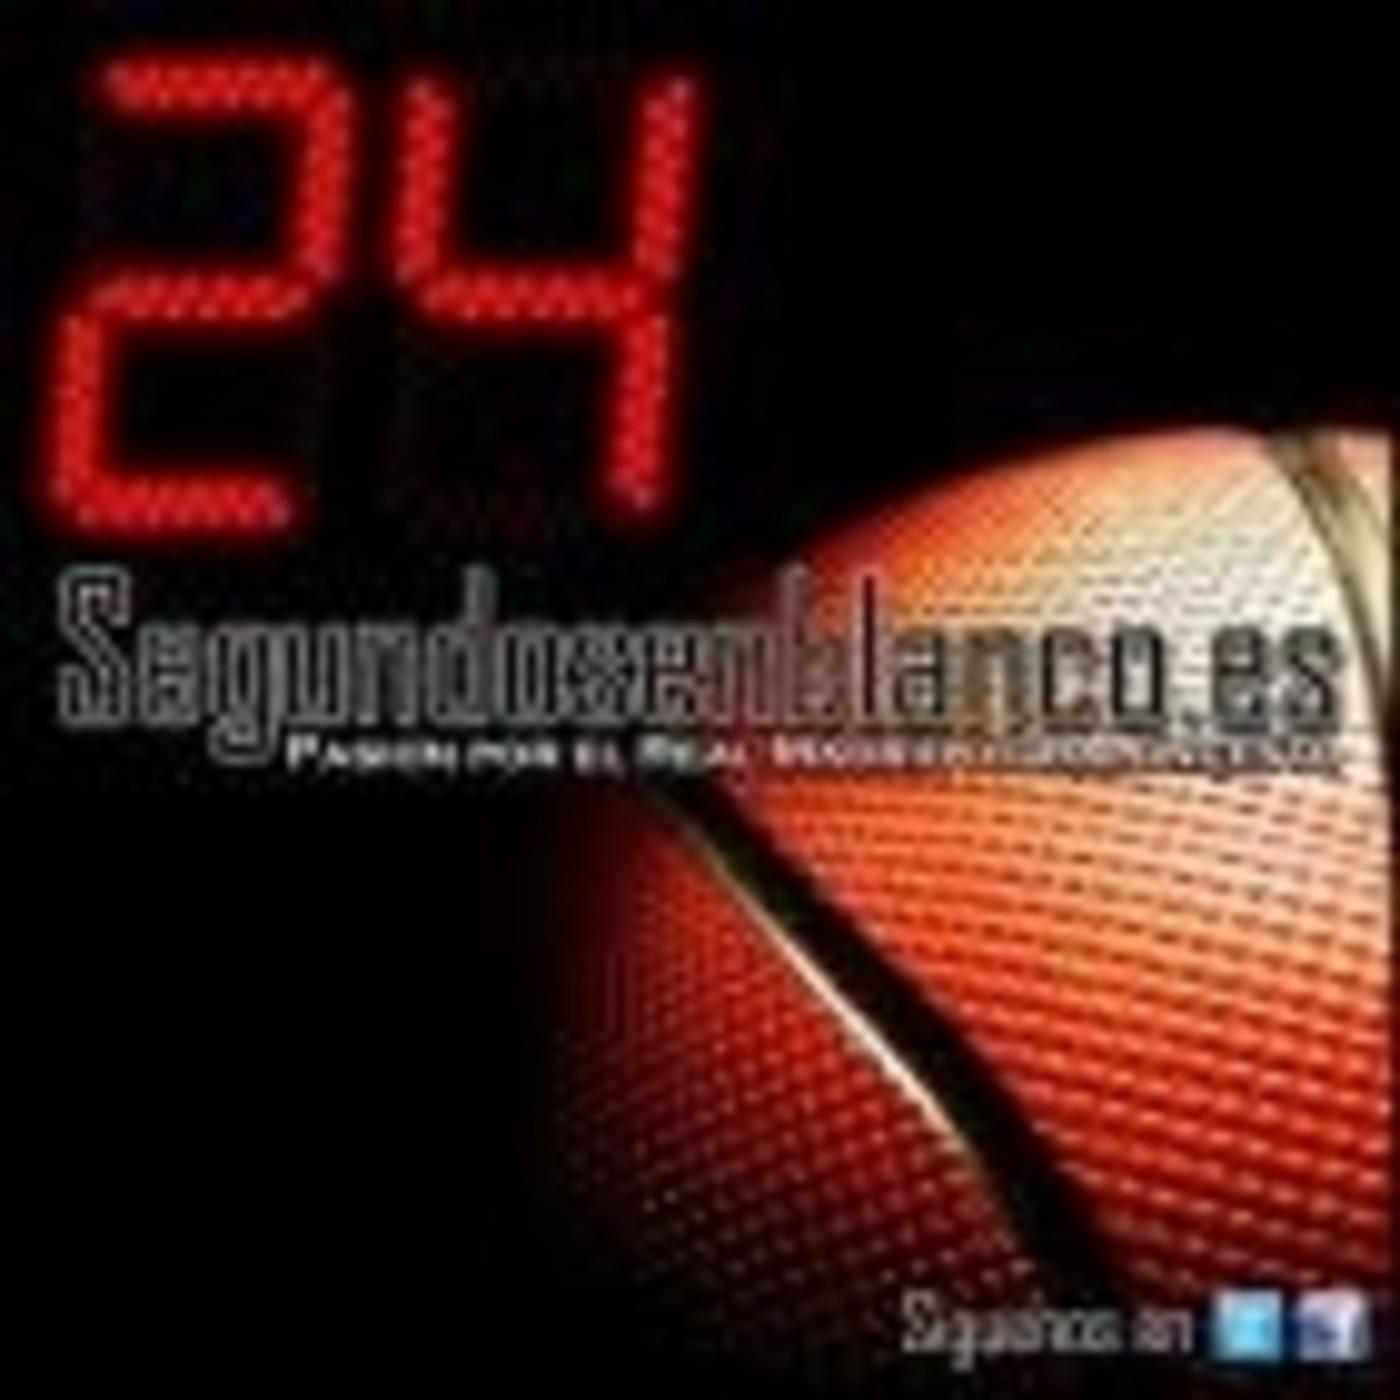 24segundosenblanco